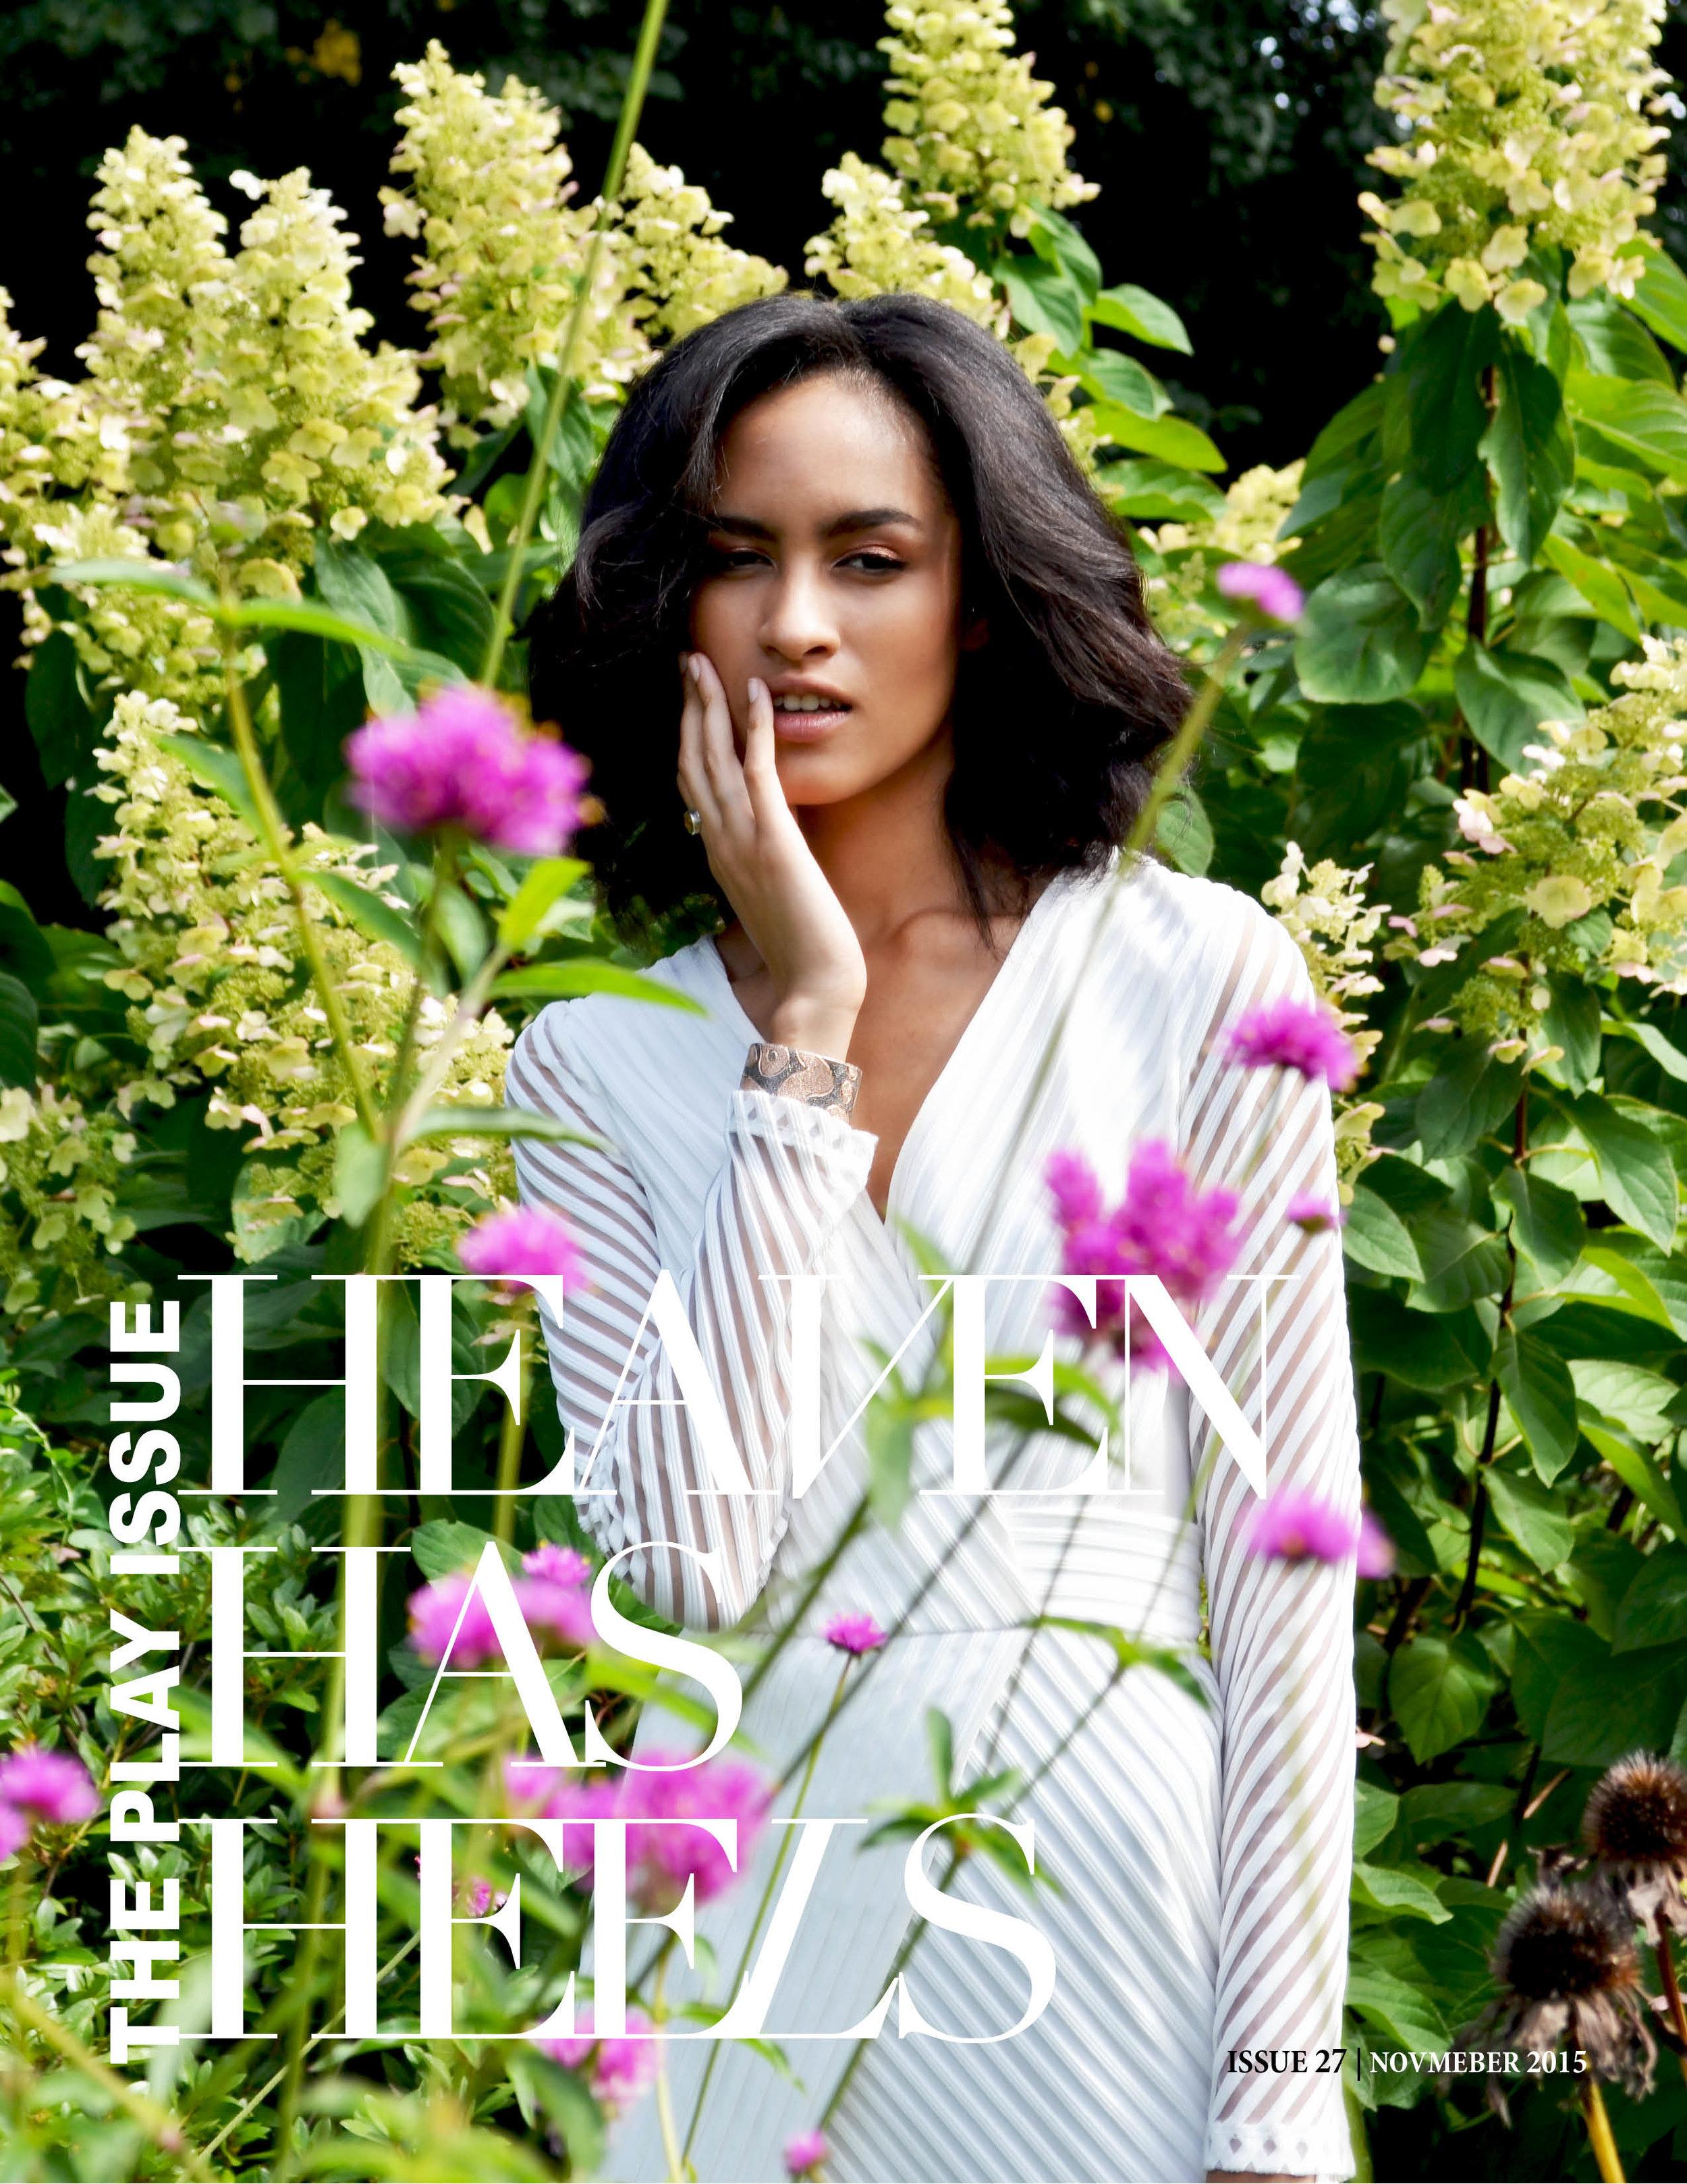 2015 Heaven Has Heels November Issue Cover.jpg